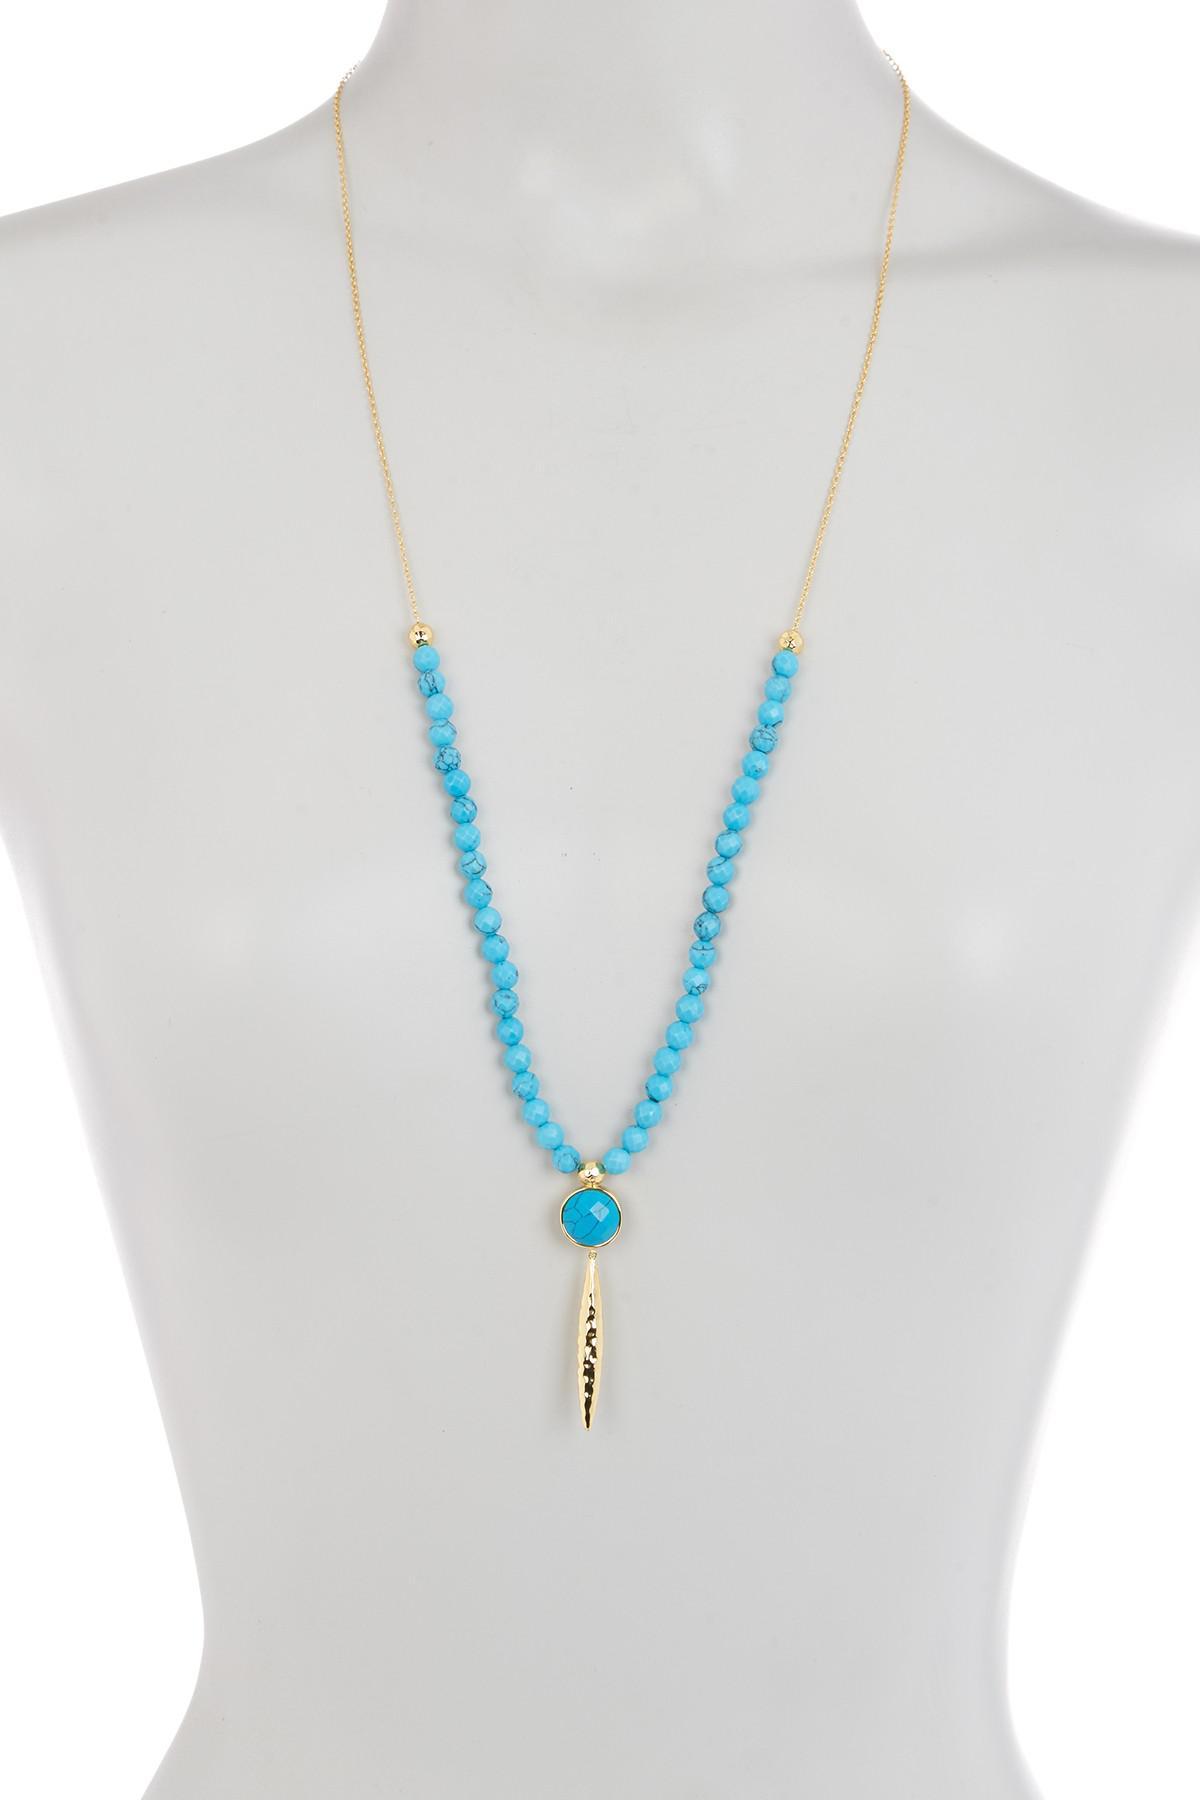 Gorjana Gypset Adjustable Turquoise Beaded Dagger Necklace vztFV41v6